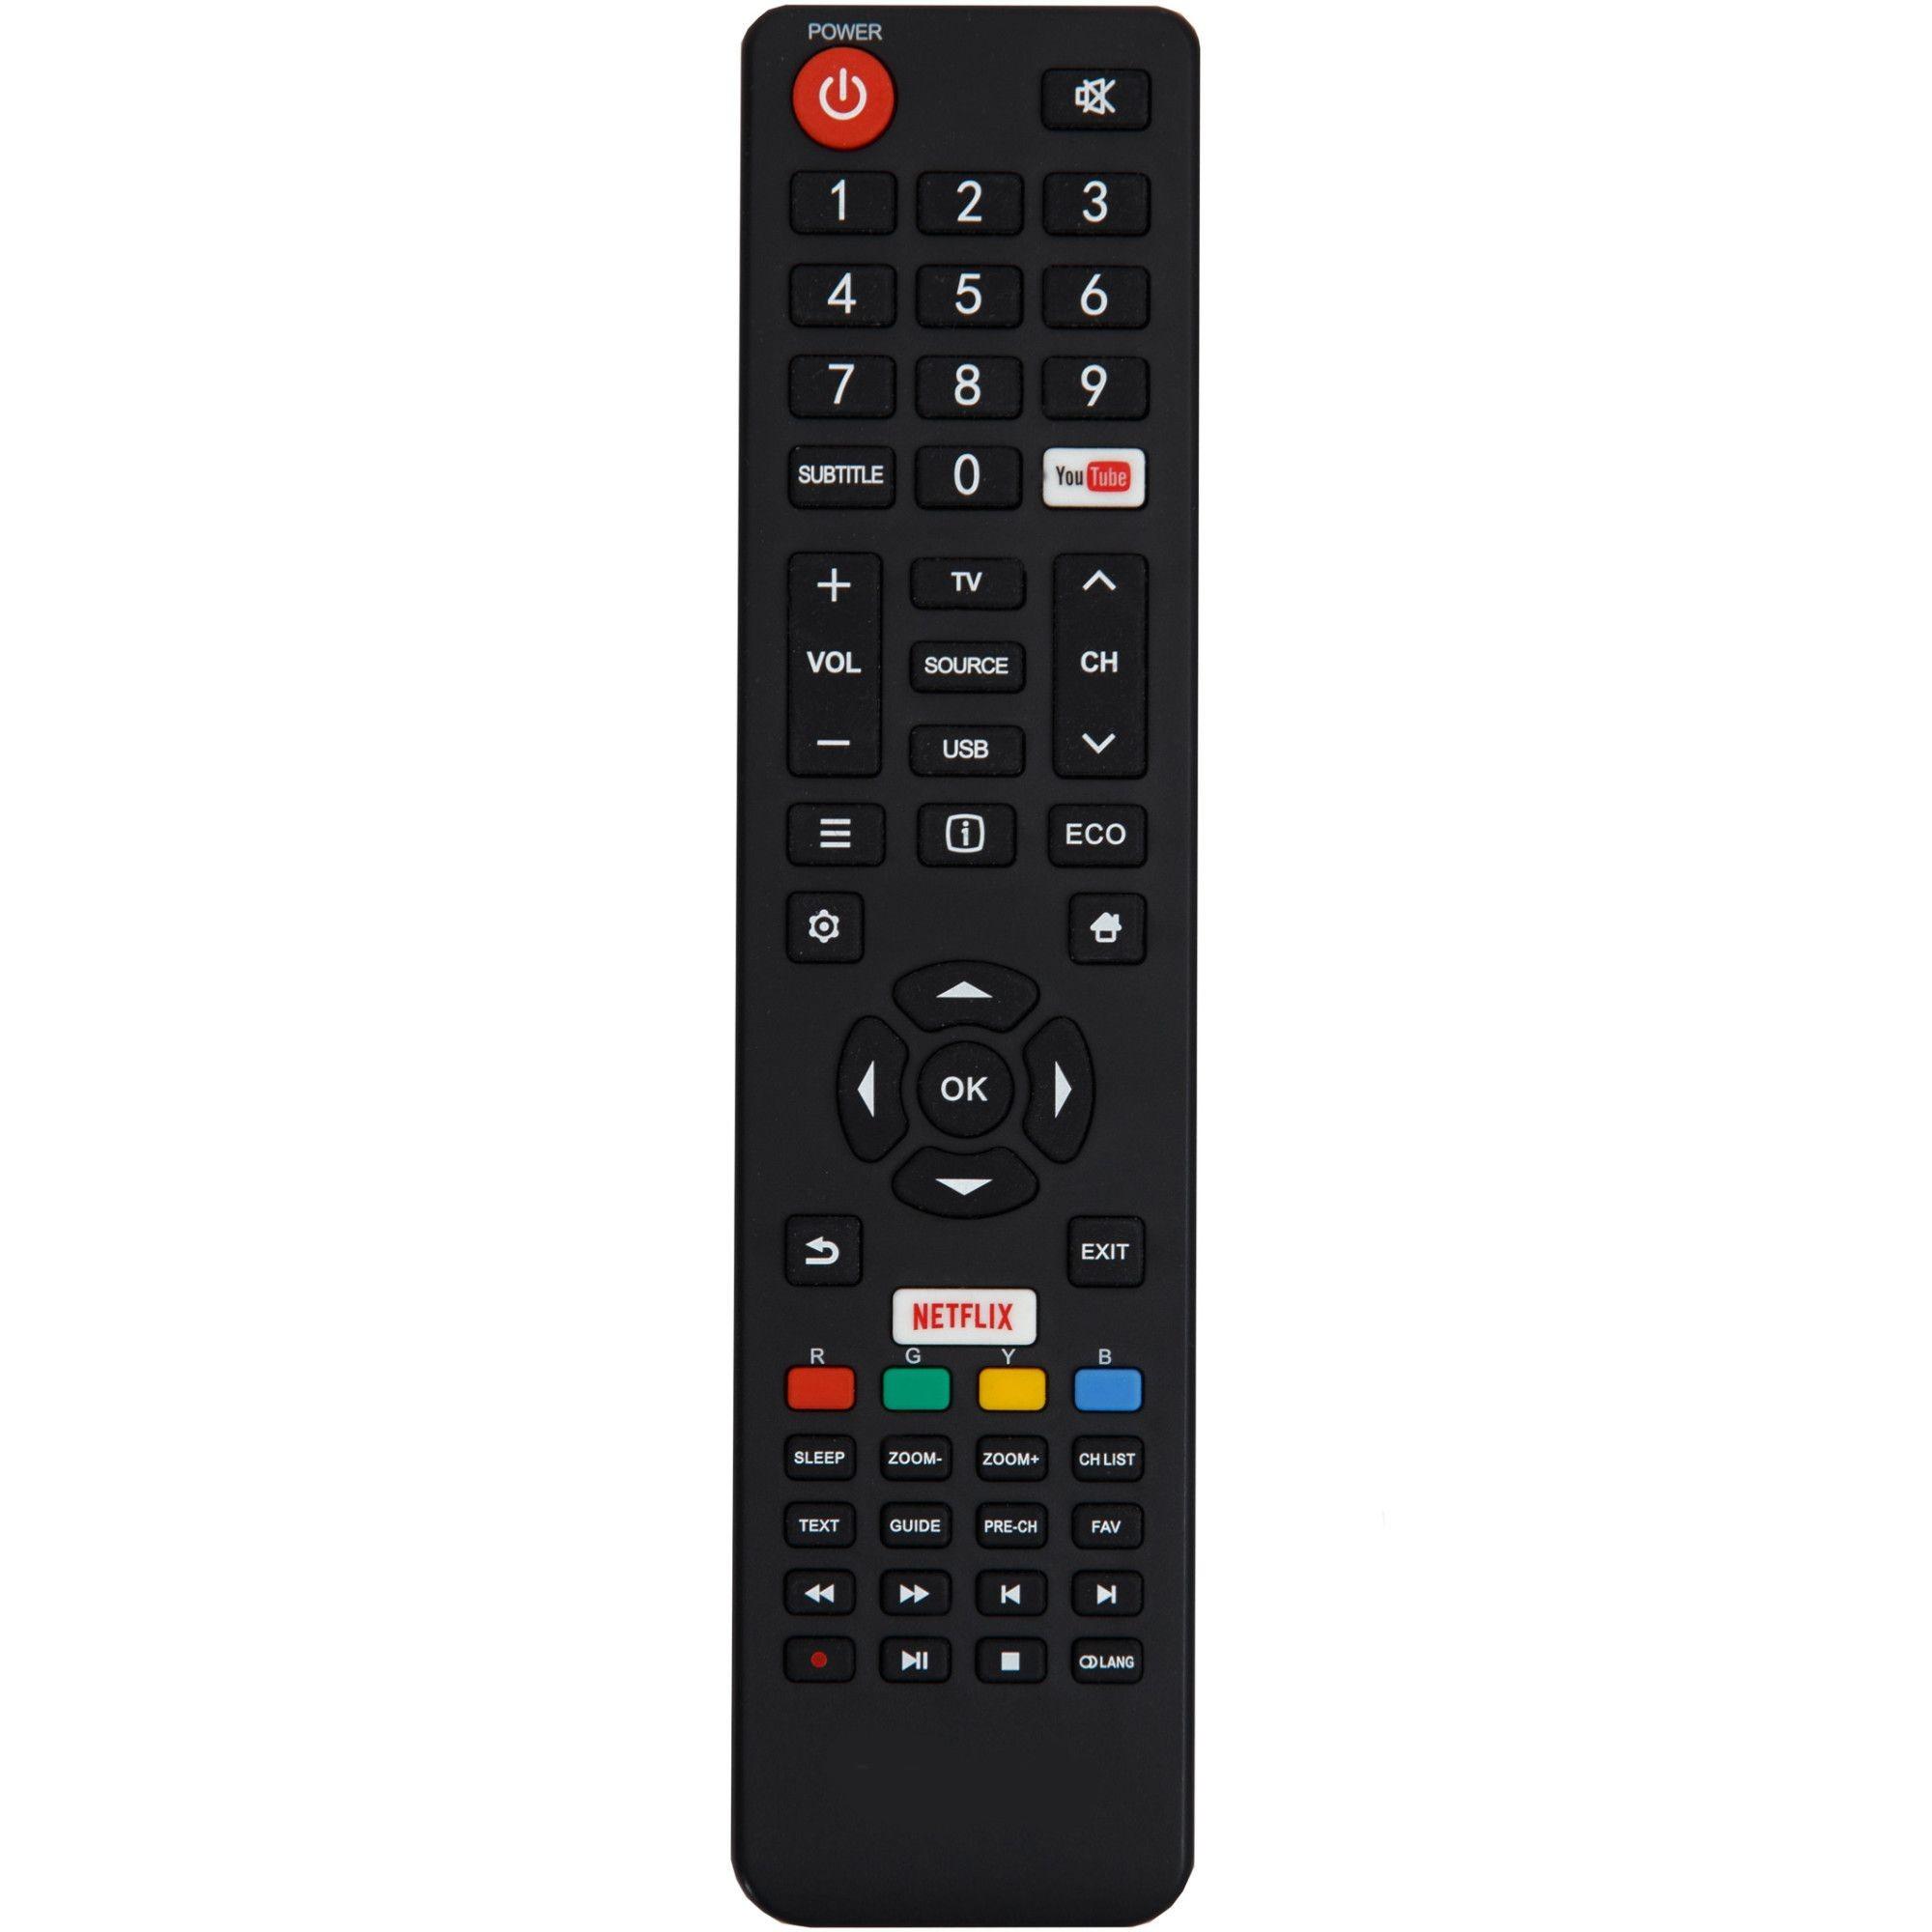 Telecomanda Vortex cu Netflix si Youtube 2